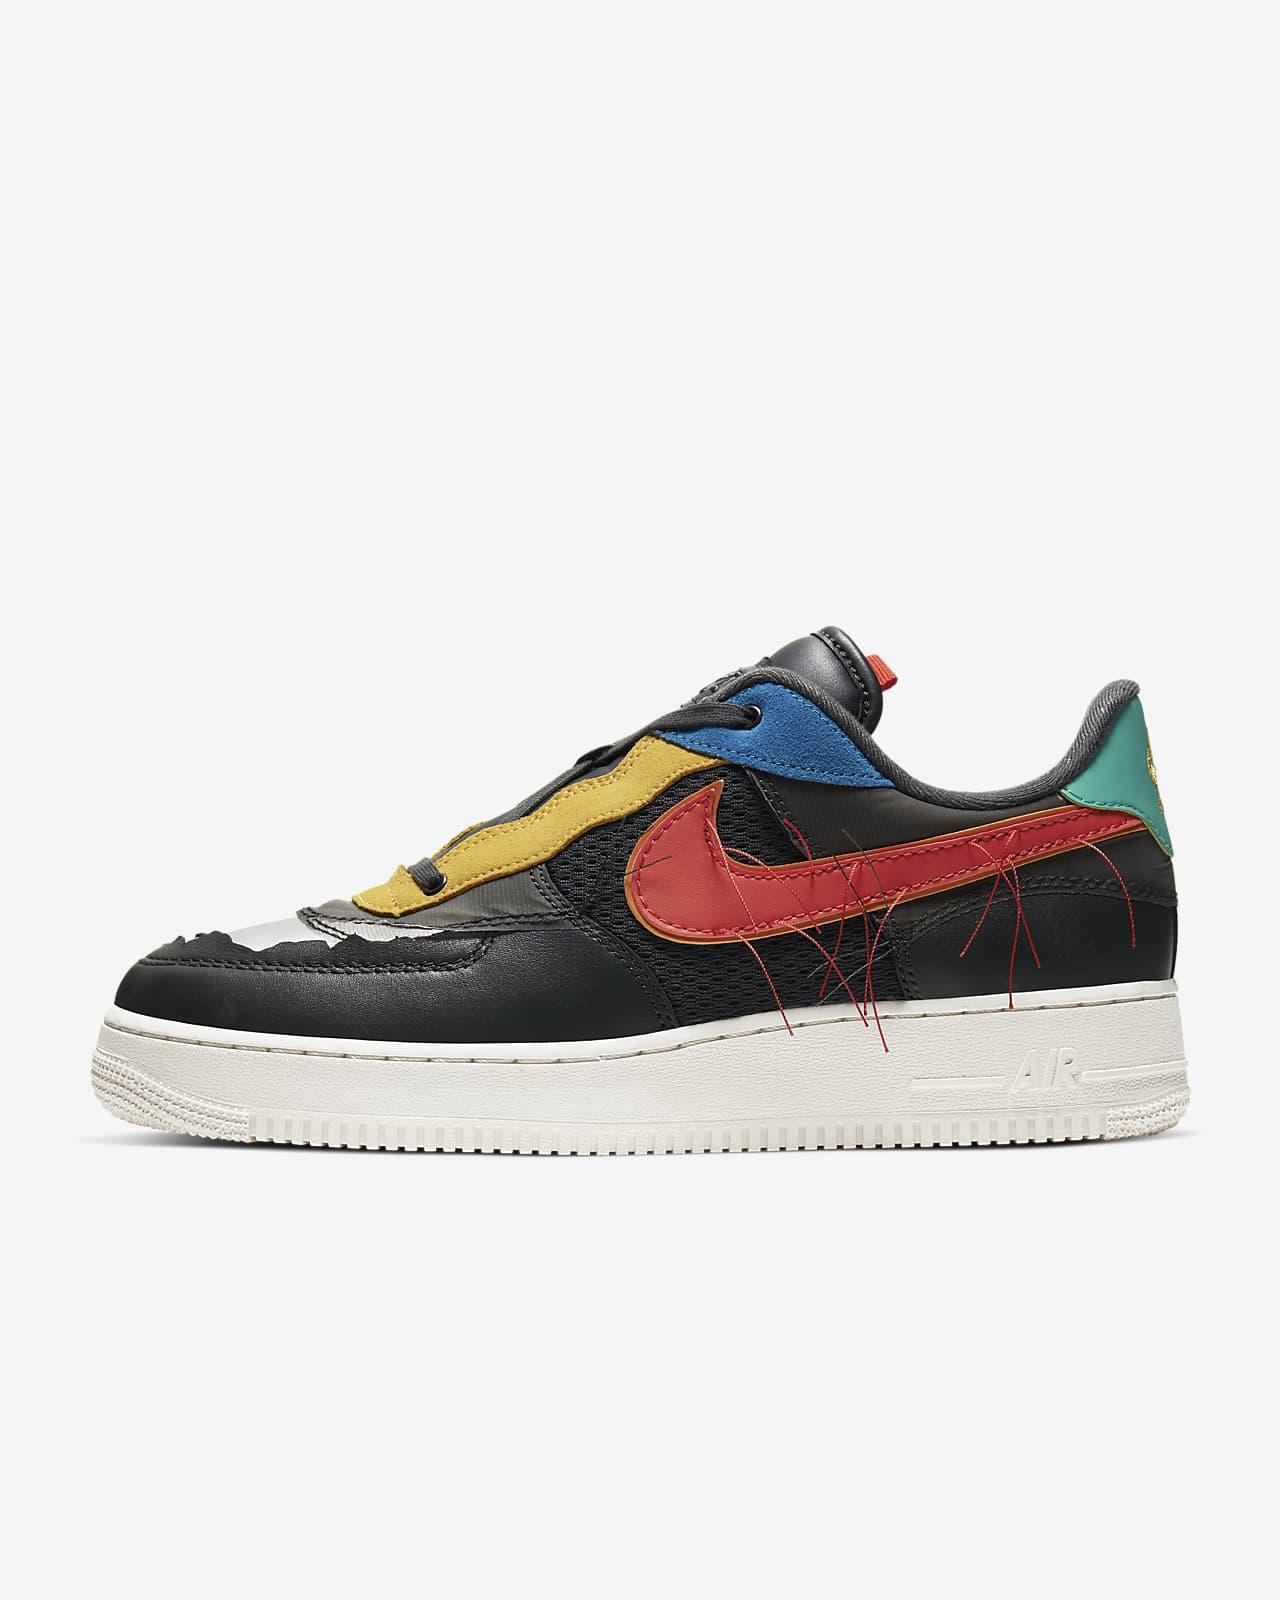 Nike Air Force 1 Low Black History